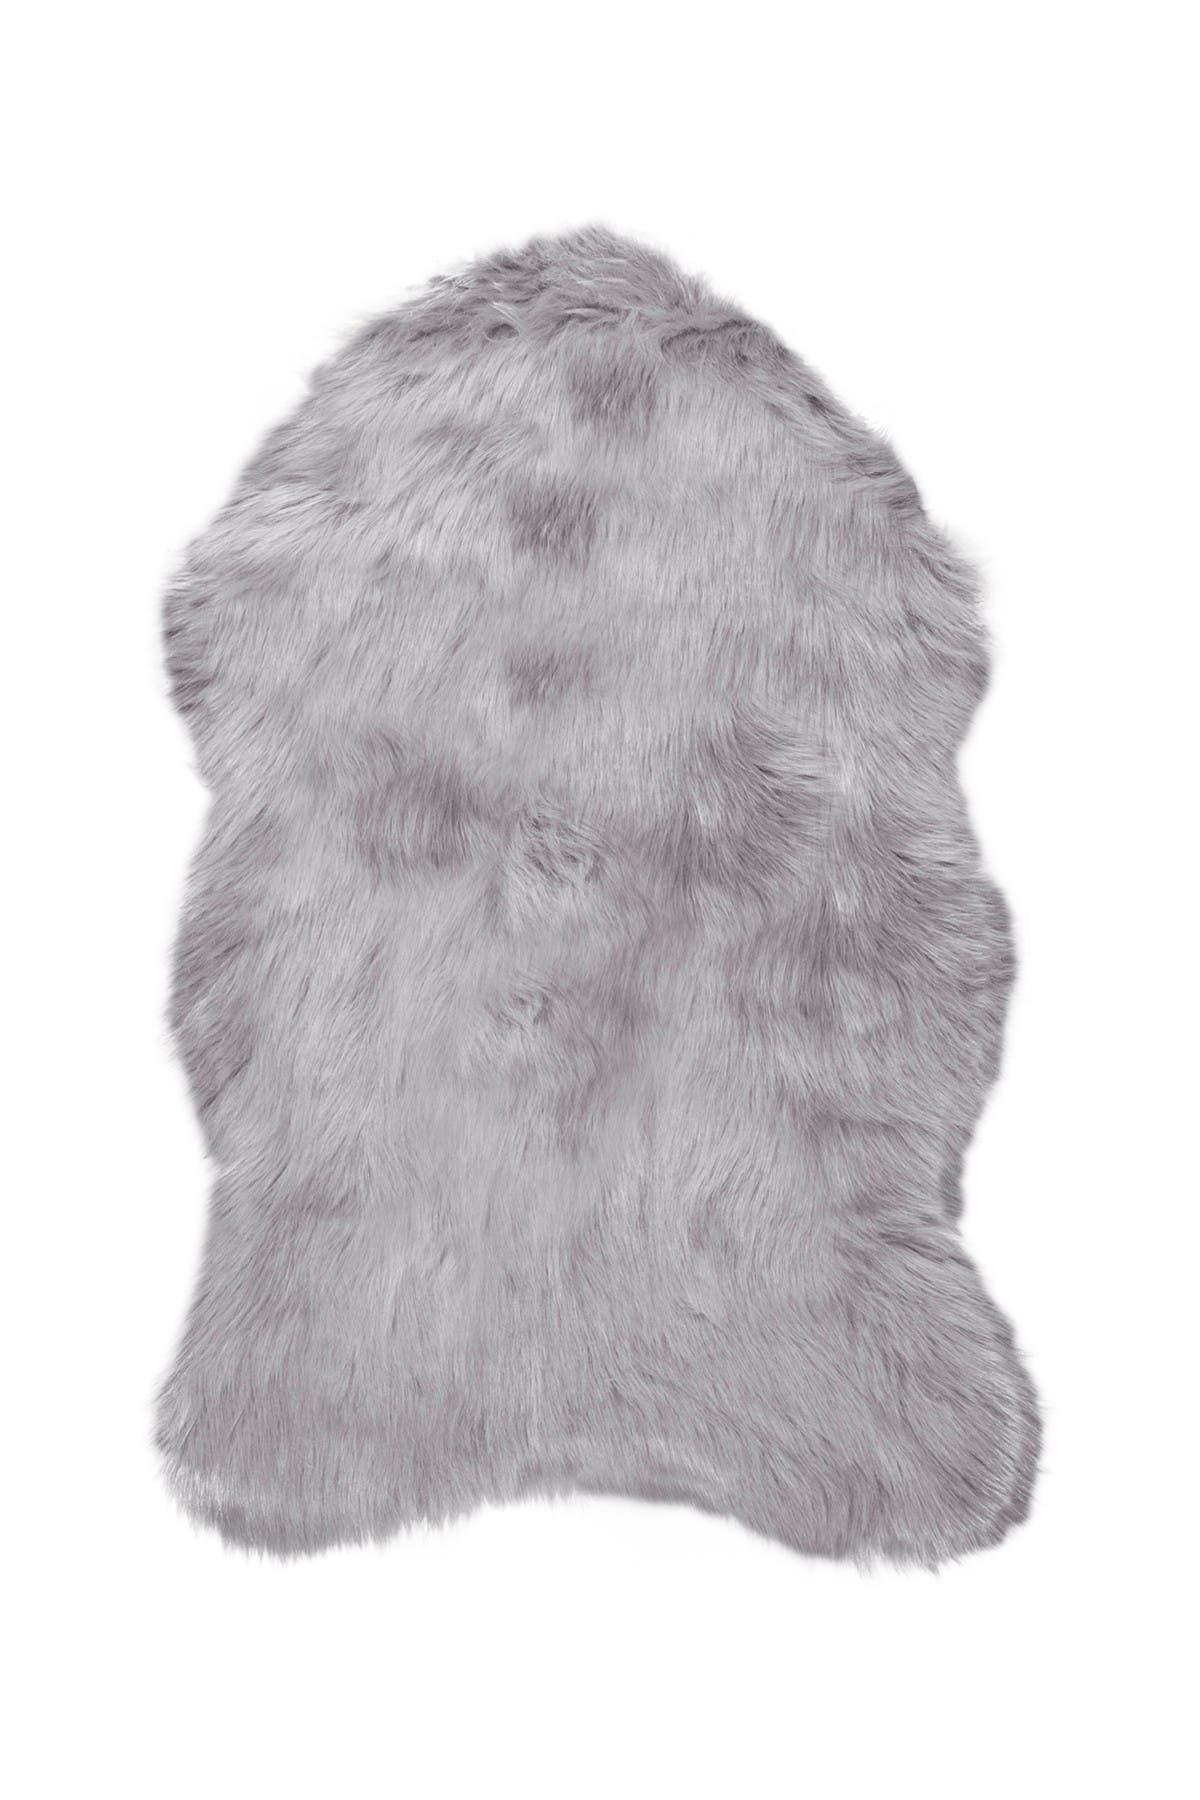 Image of LUXE Gordon Faux Fur Throw - 2ft x 3ft - Sage Grey